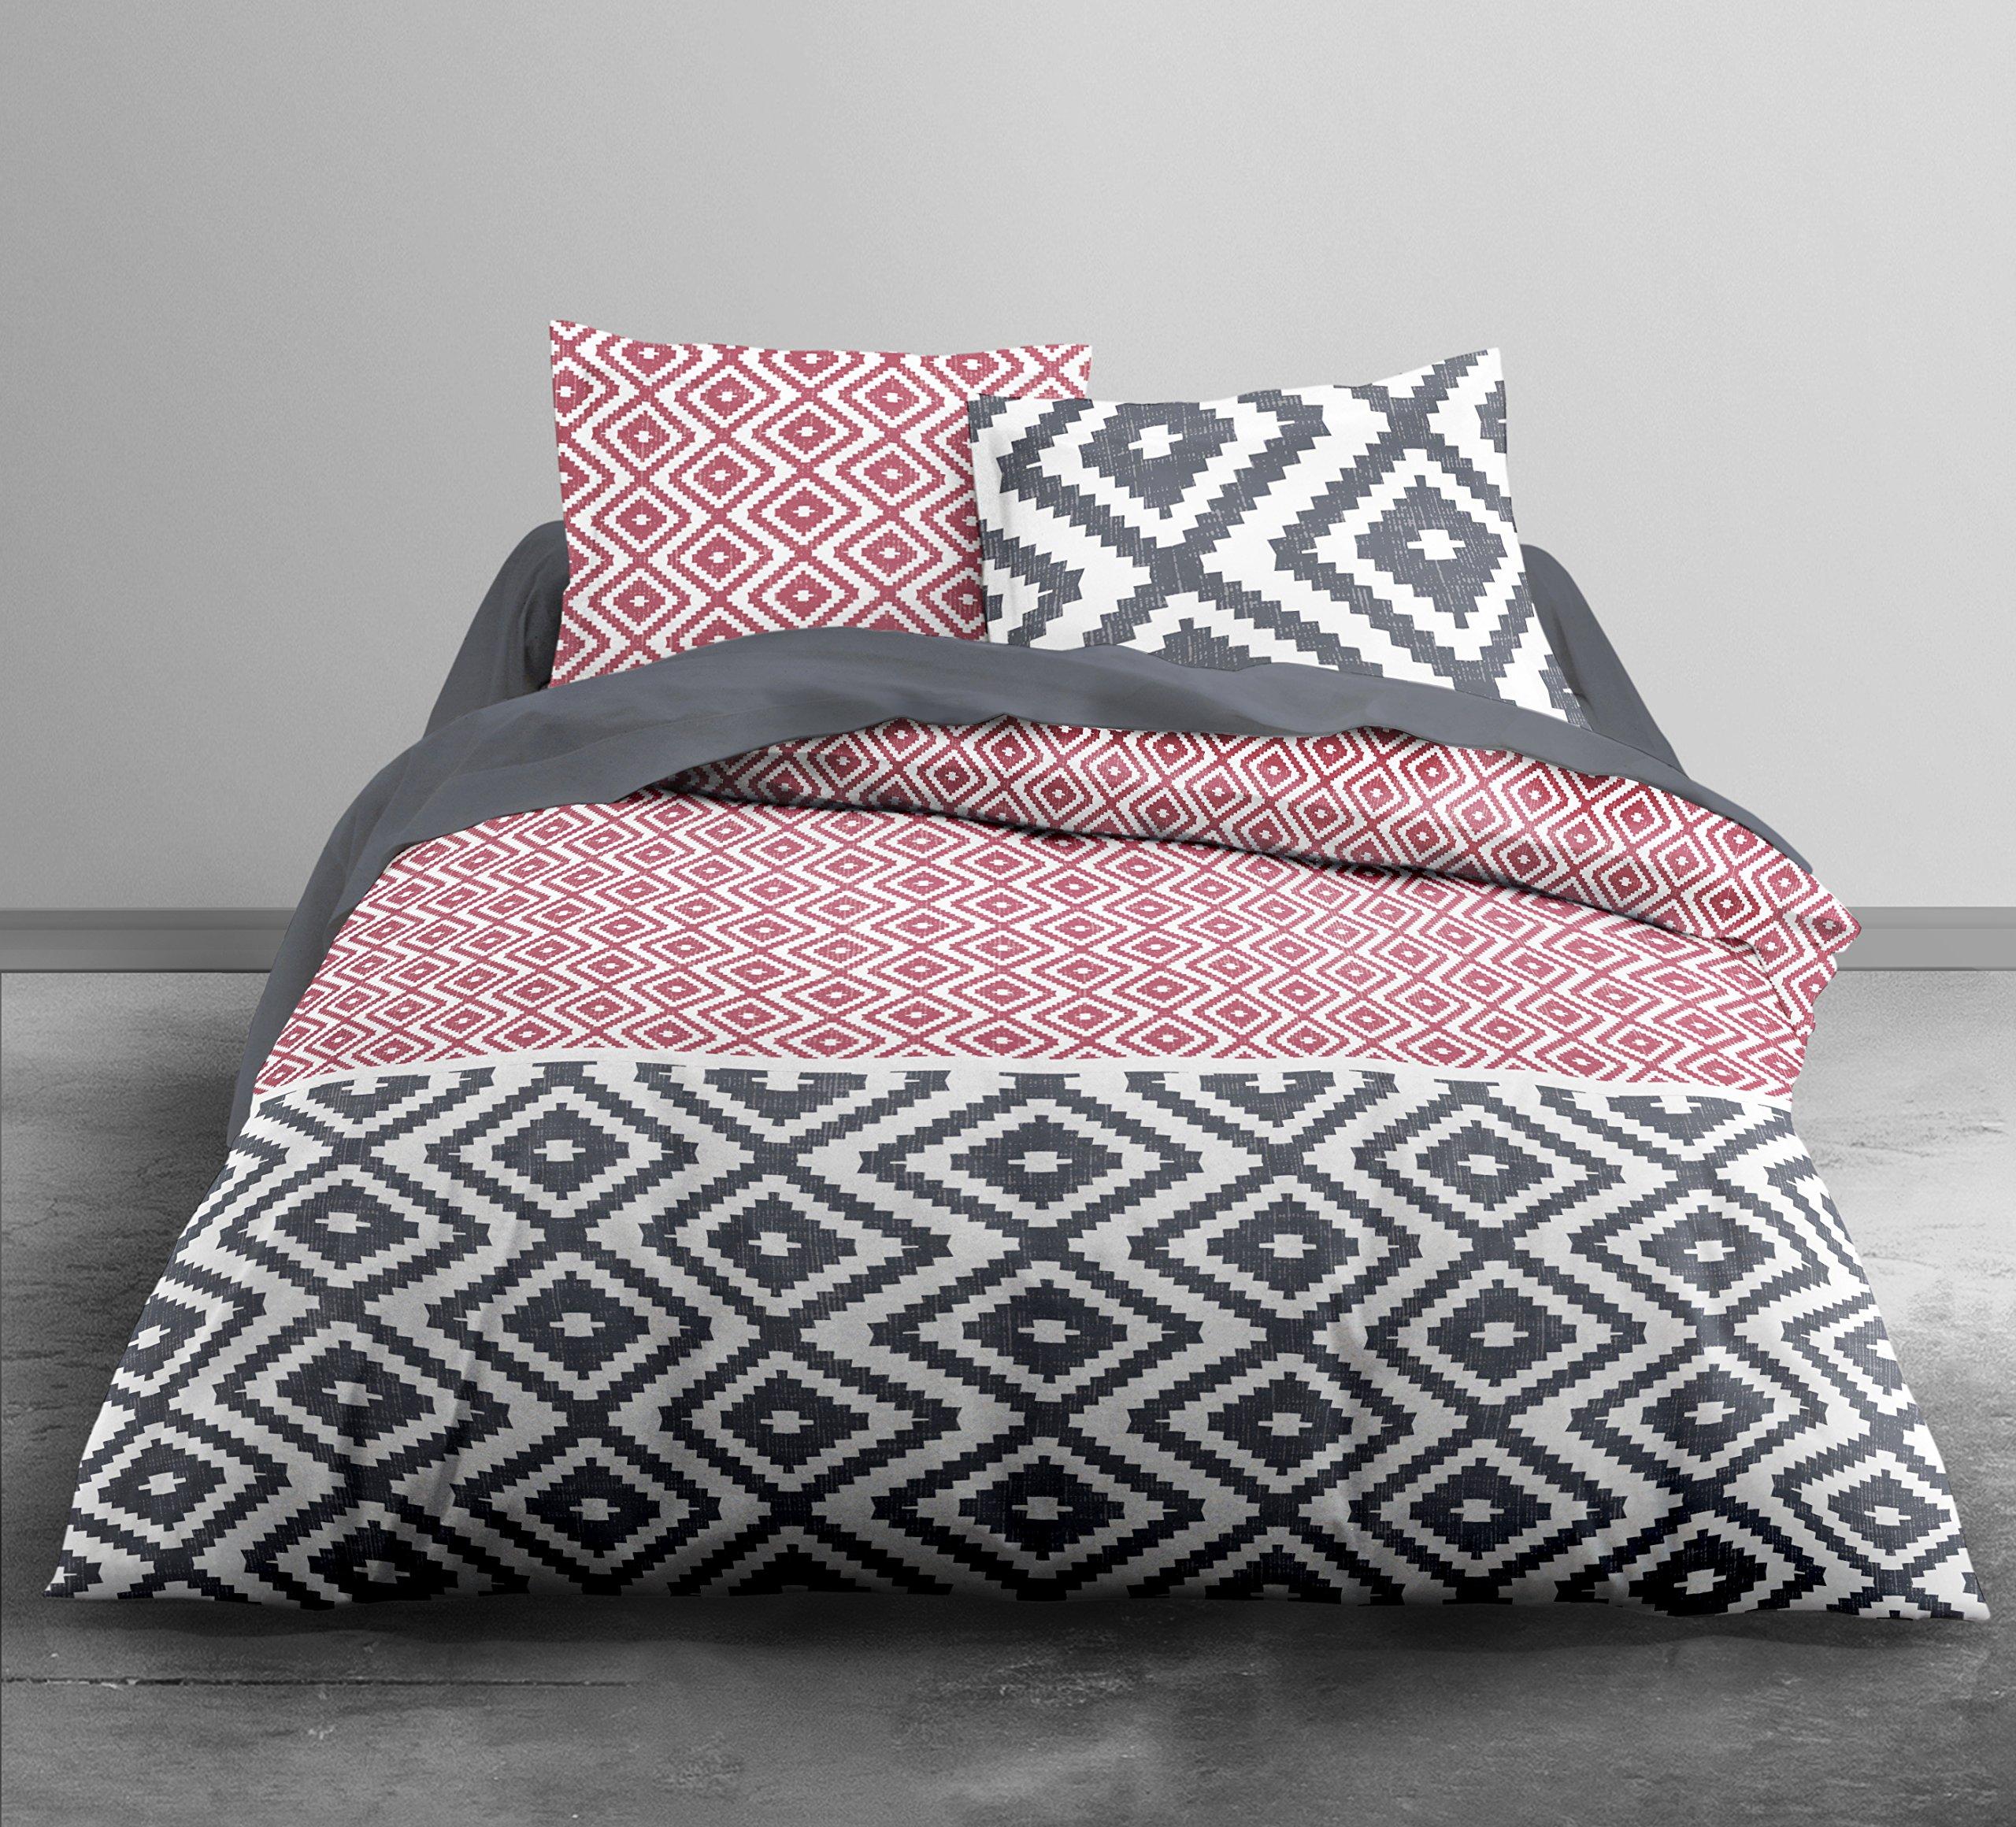 Funda nórdica de Kami. 220 x 240 cm, dos fundas de almohada de 63 x 63 cm, 100 % algodón 57 hilos: Amazon.es: Hogar